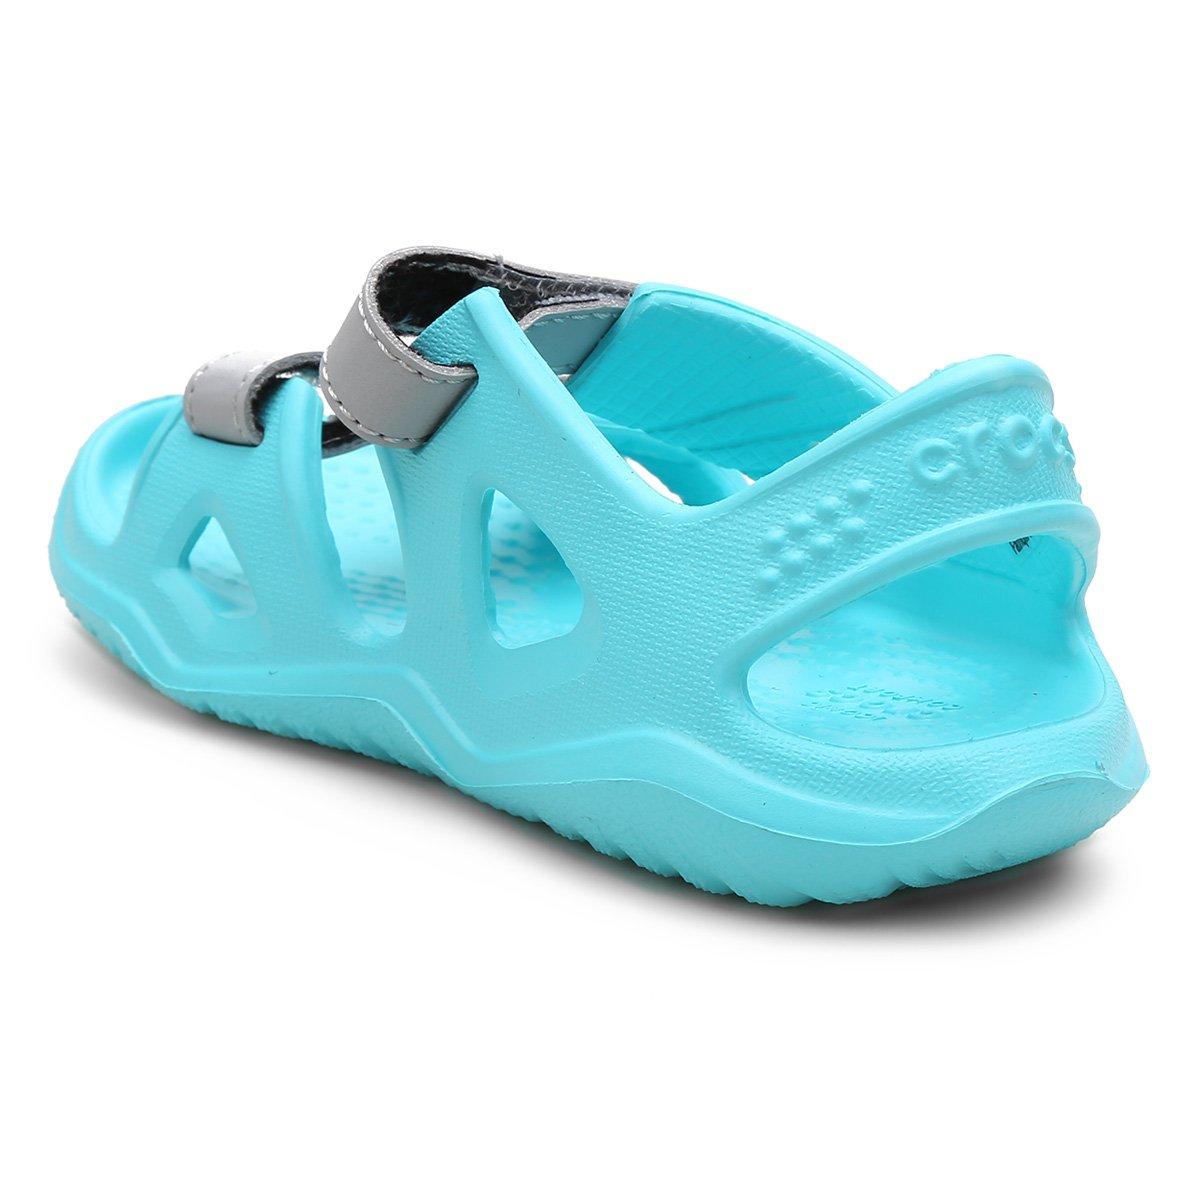 Foto 2 - Papete Infantil Crocs Velcro Swiftwater River